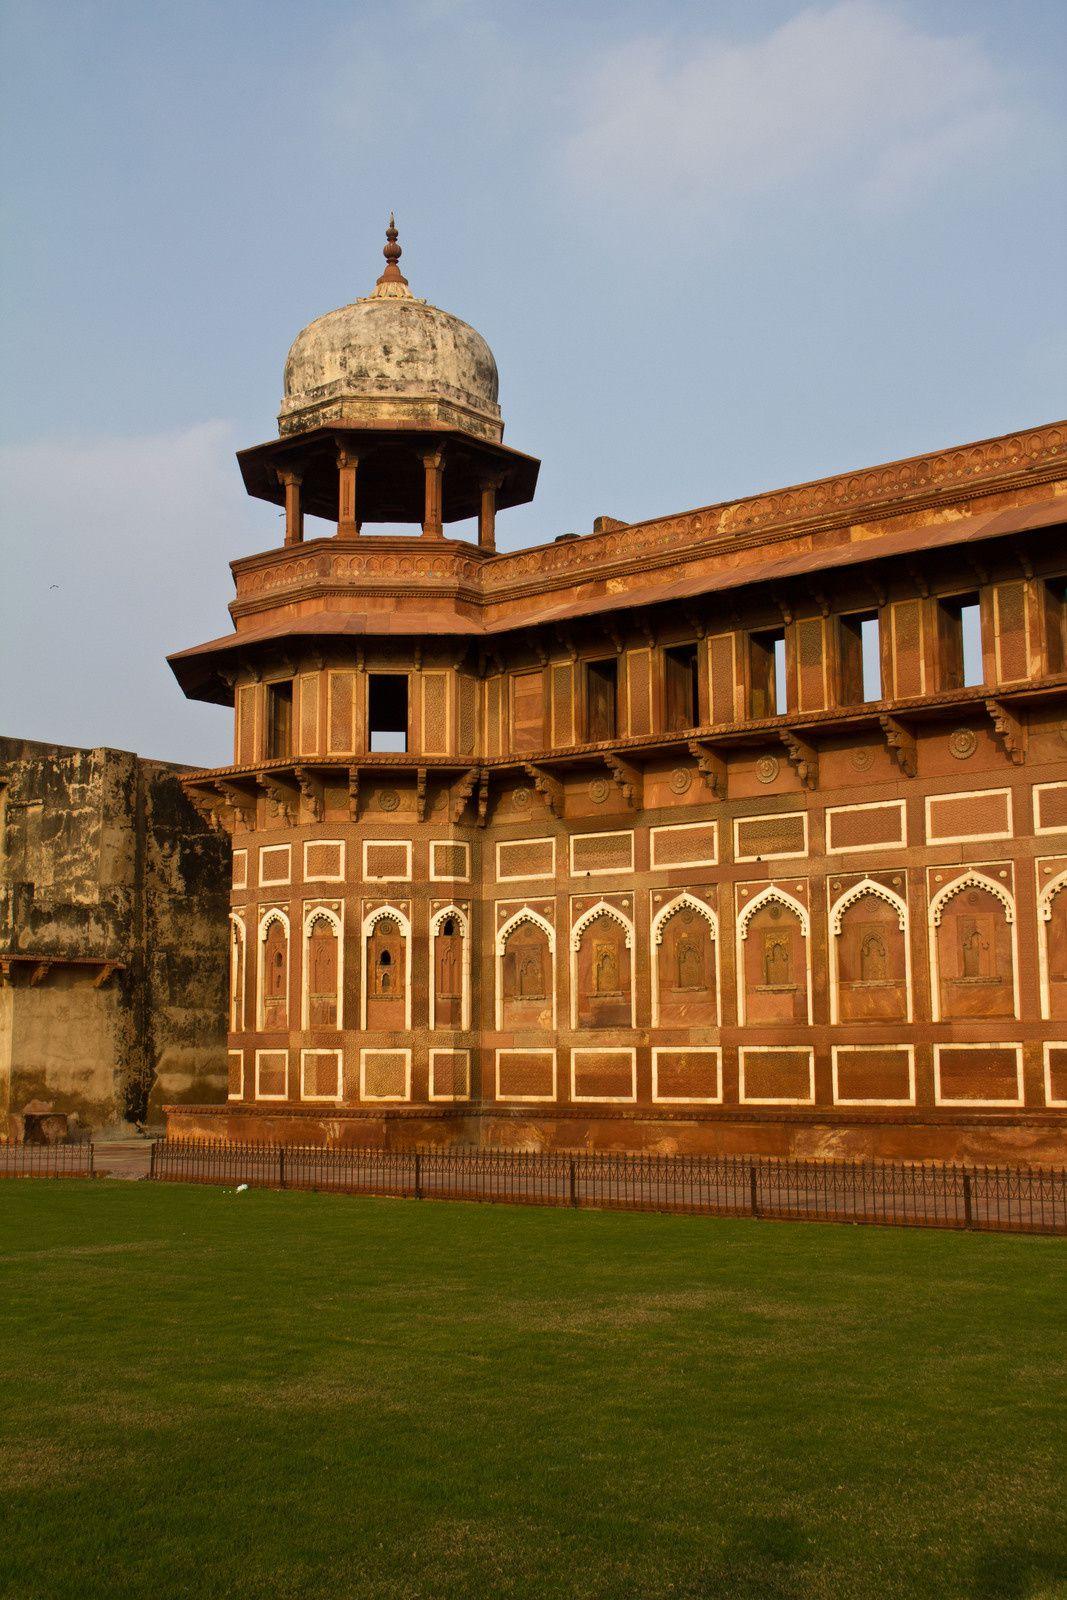 Vues du Palais de Jahangir